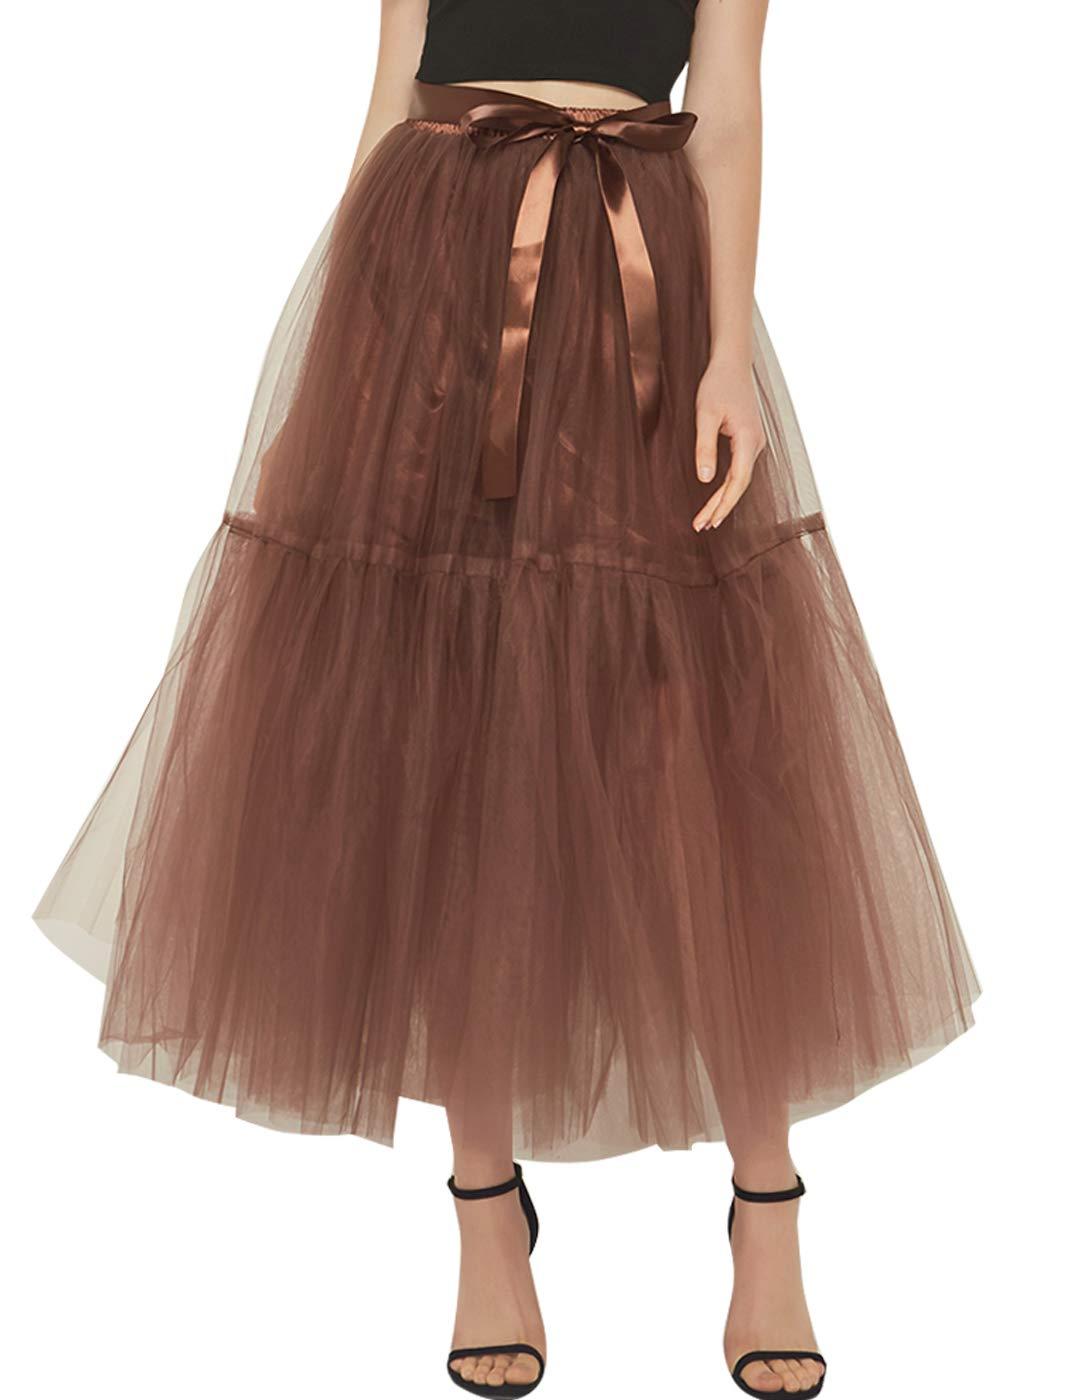 FEOYA Women's Long Maxi Tulle Skirt High Waist A Line Ankle Length Prom Bridesmaids Petticoat with Belt